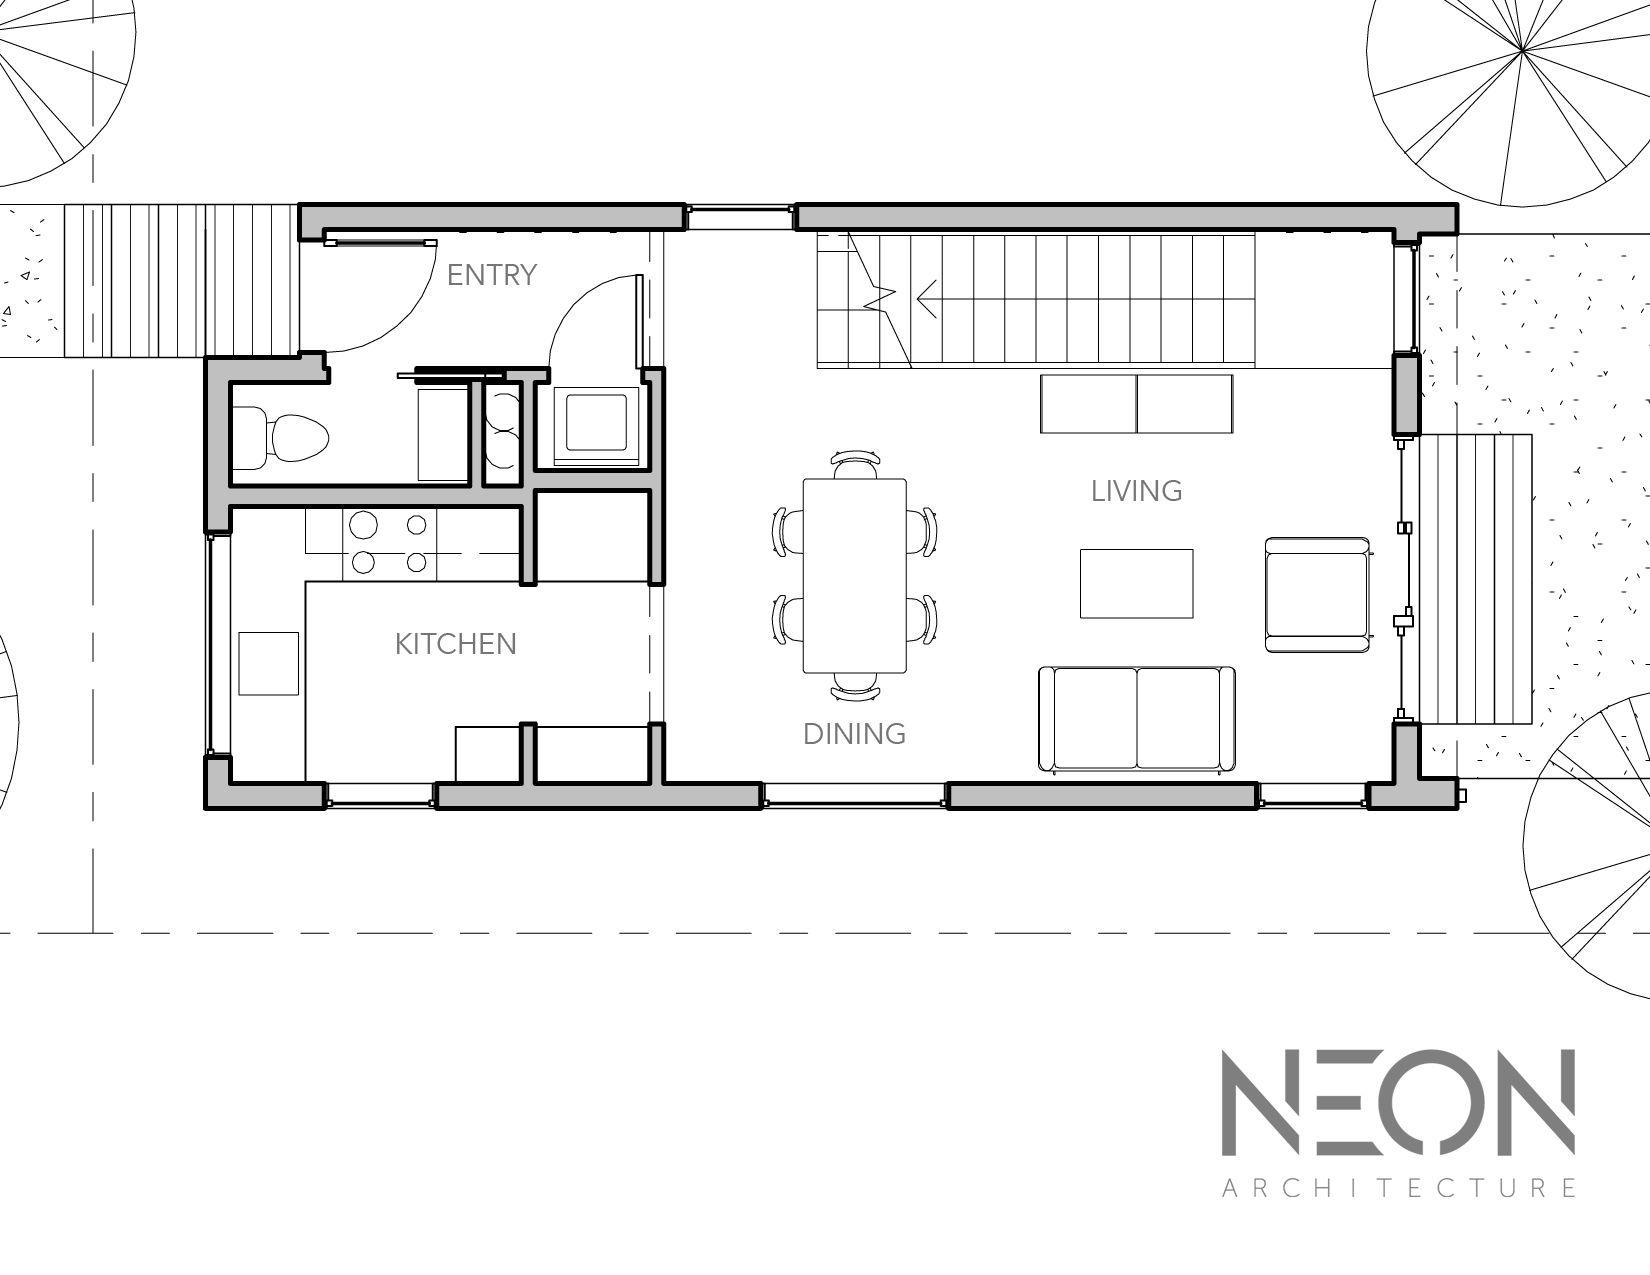 NEON Architecture | CUBE HOUSE